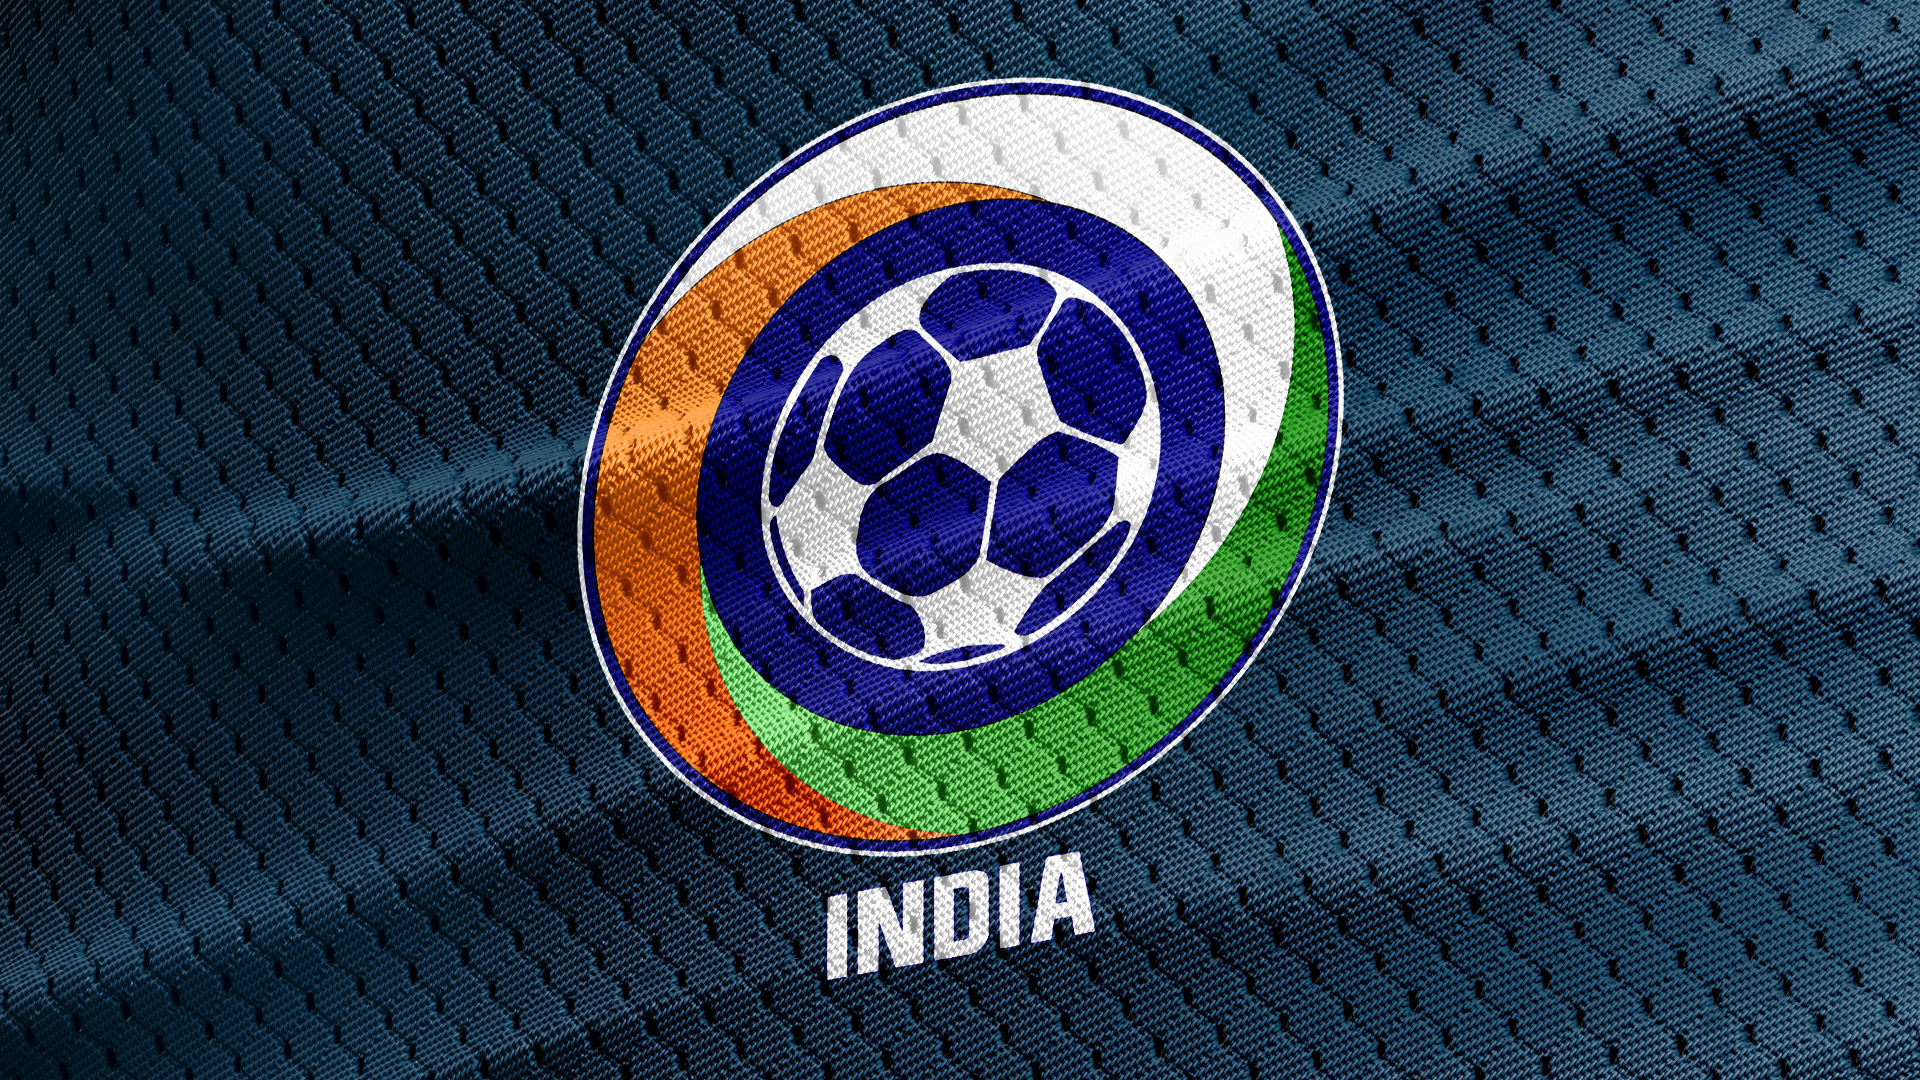 Indian Football Team Rebranding Football Rebranding Football Team